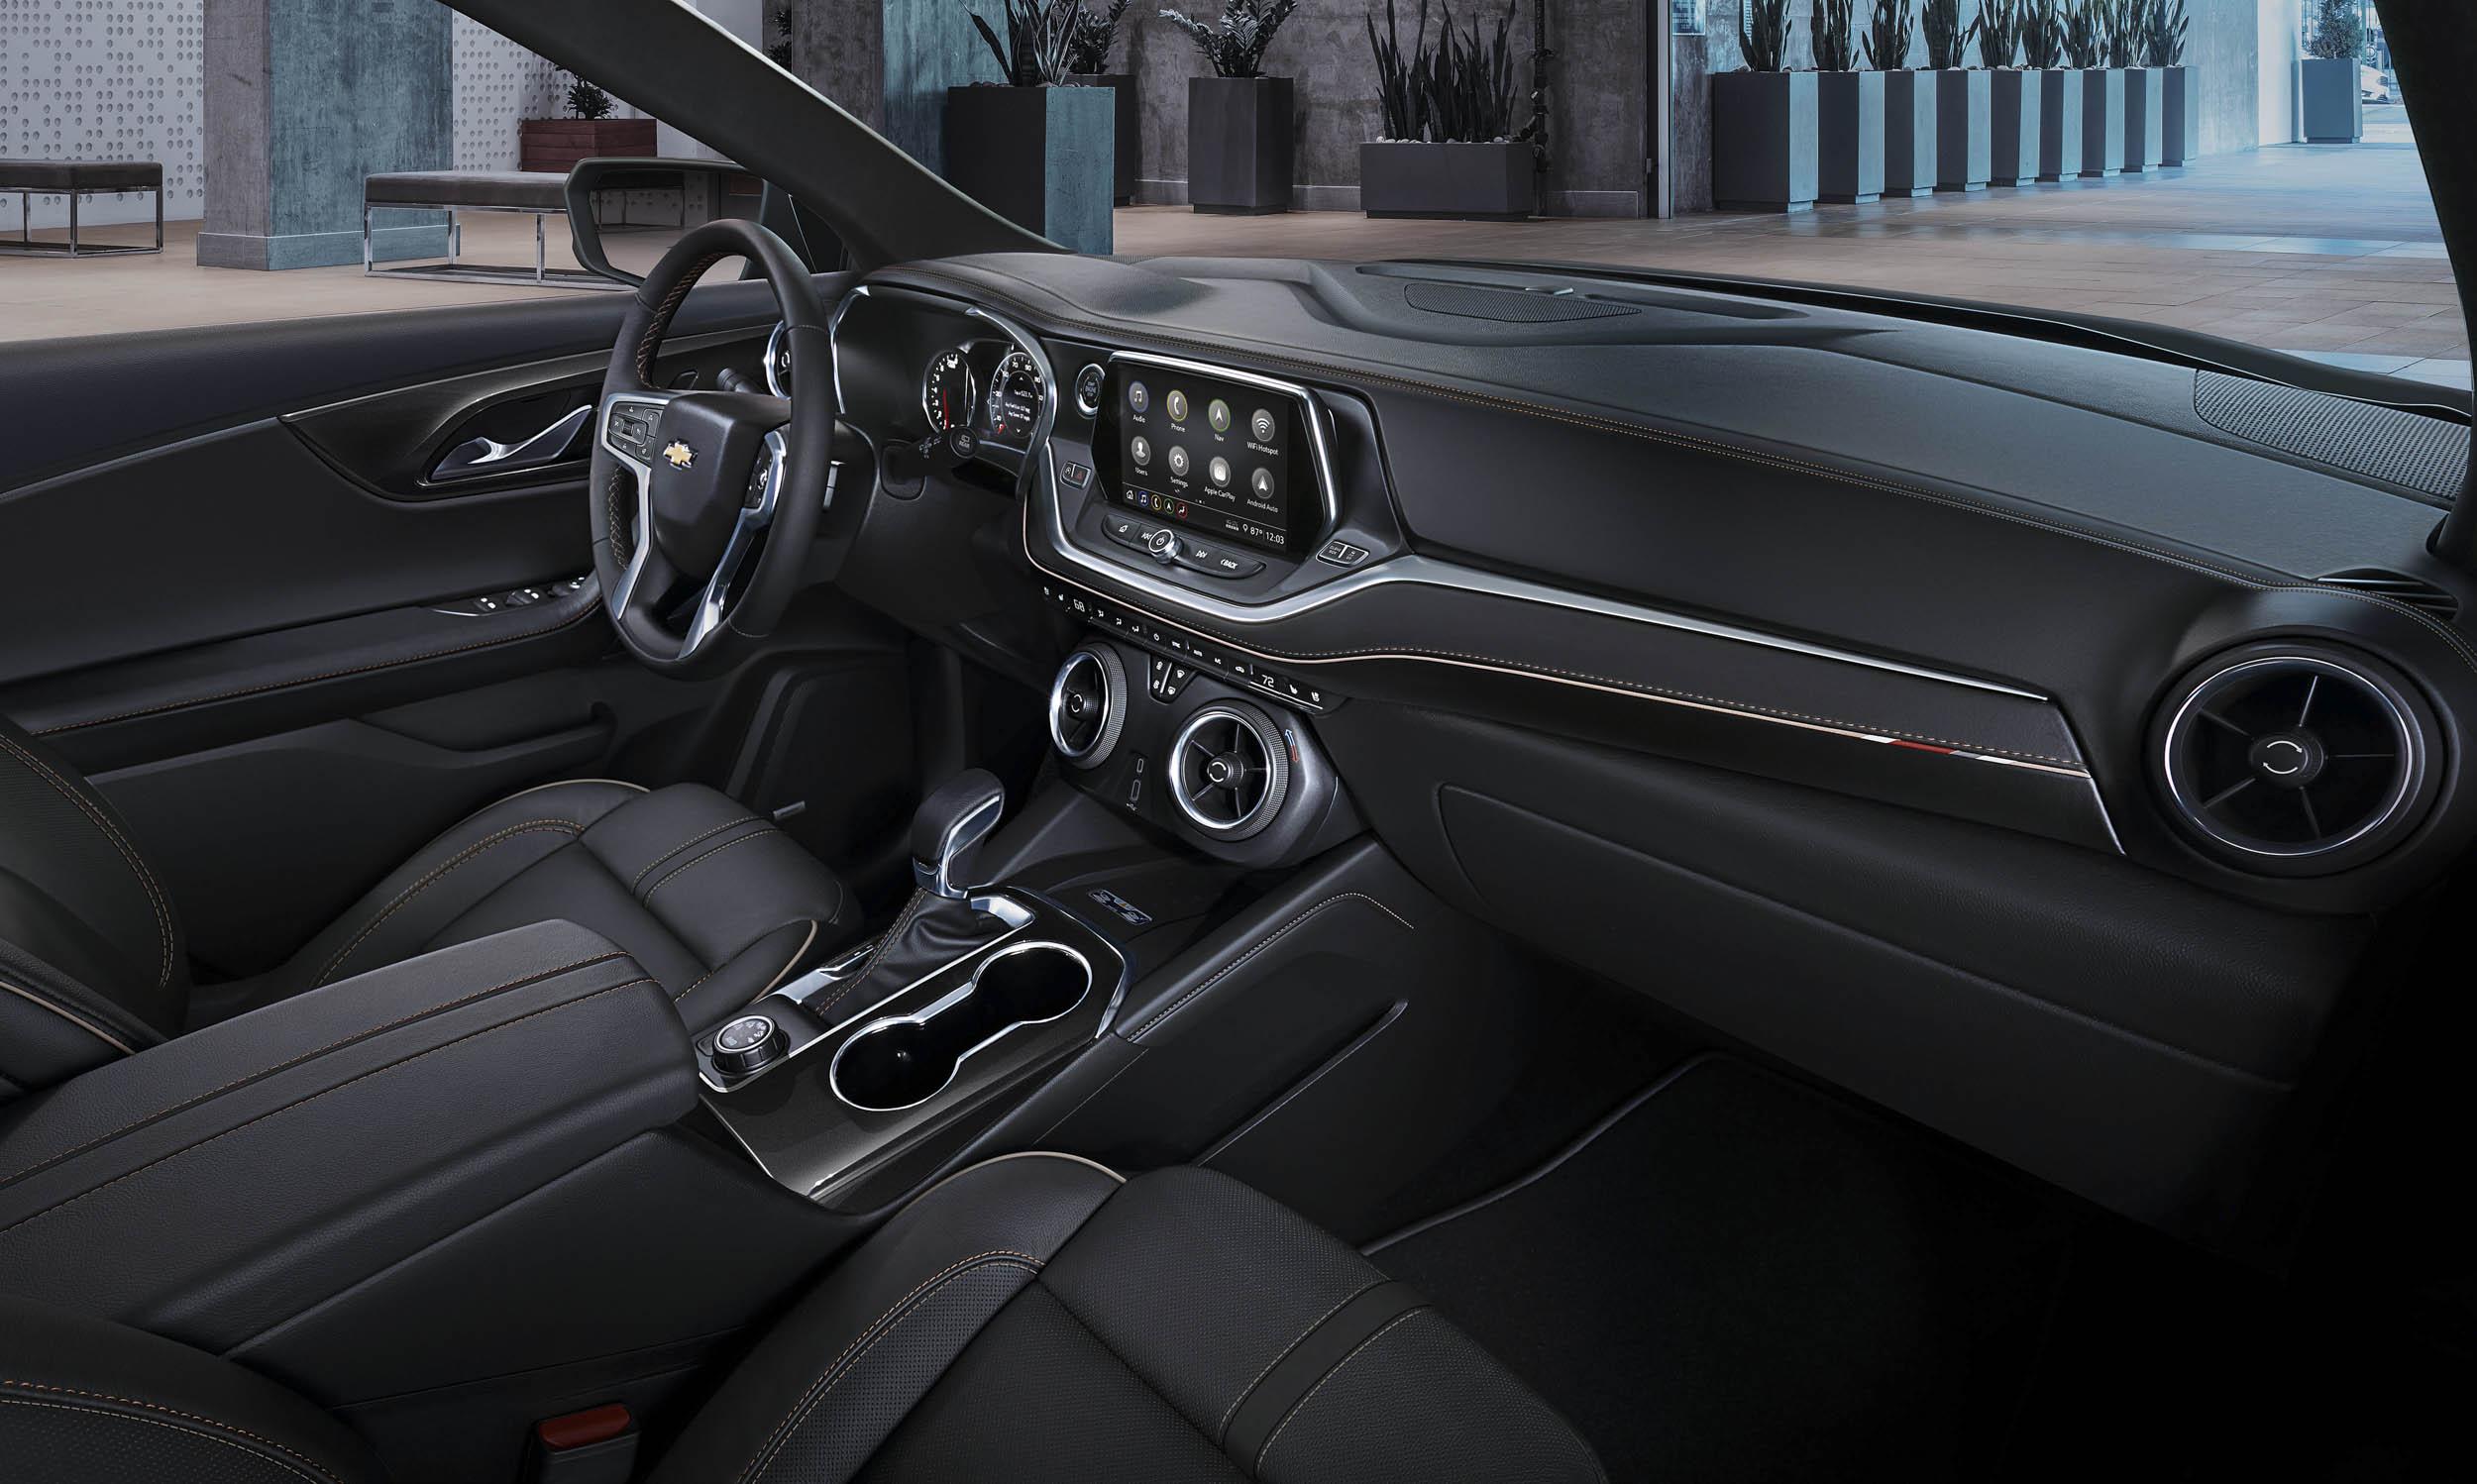 2019 Chevrolet Blazer interior and dash